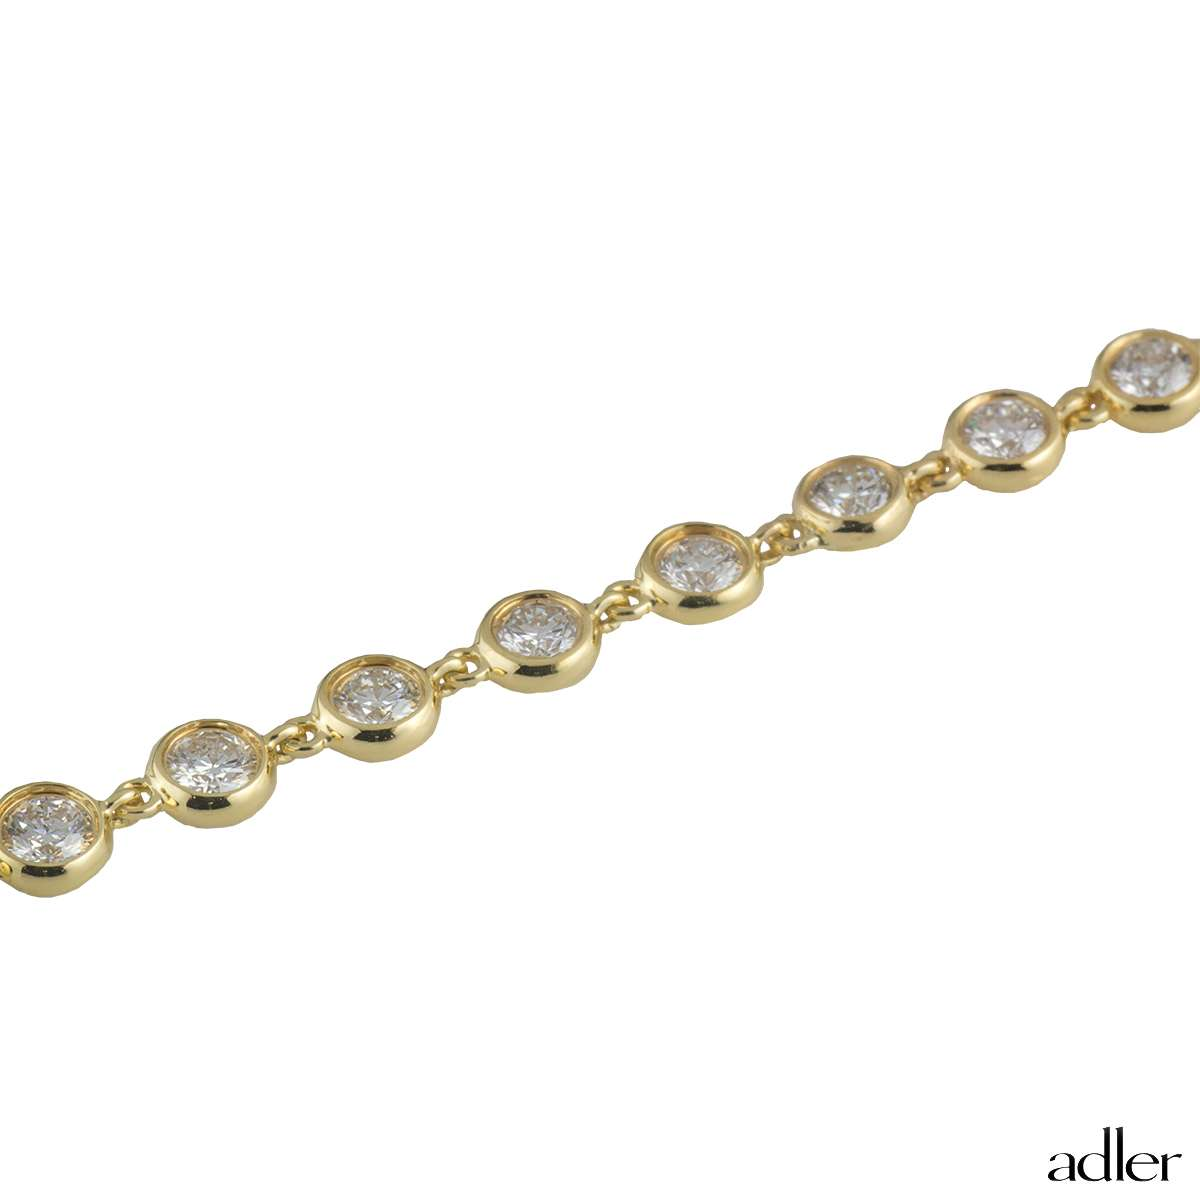 Adler 18k Yellow Gold Diamond Line Necklace 17.20ct